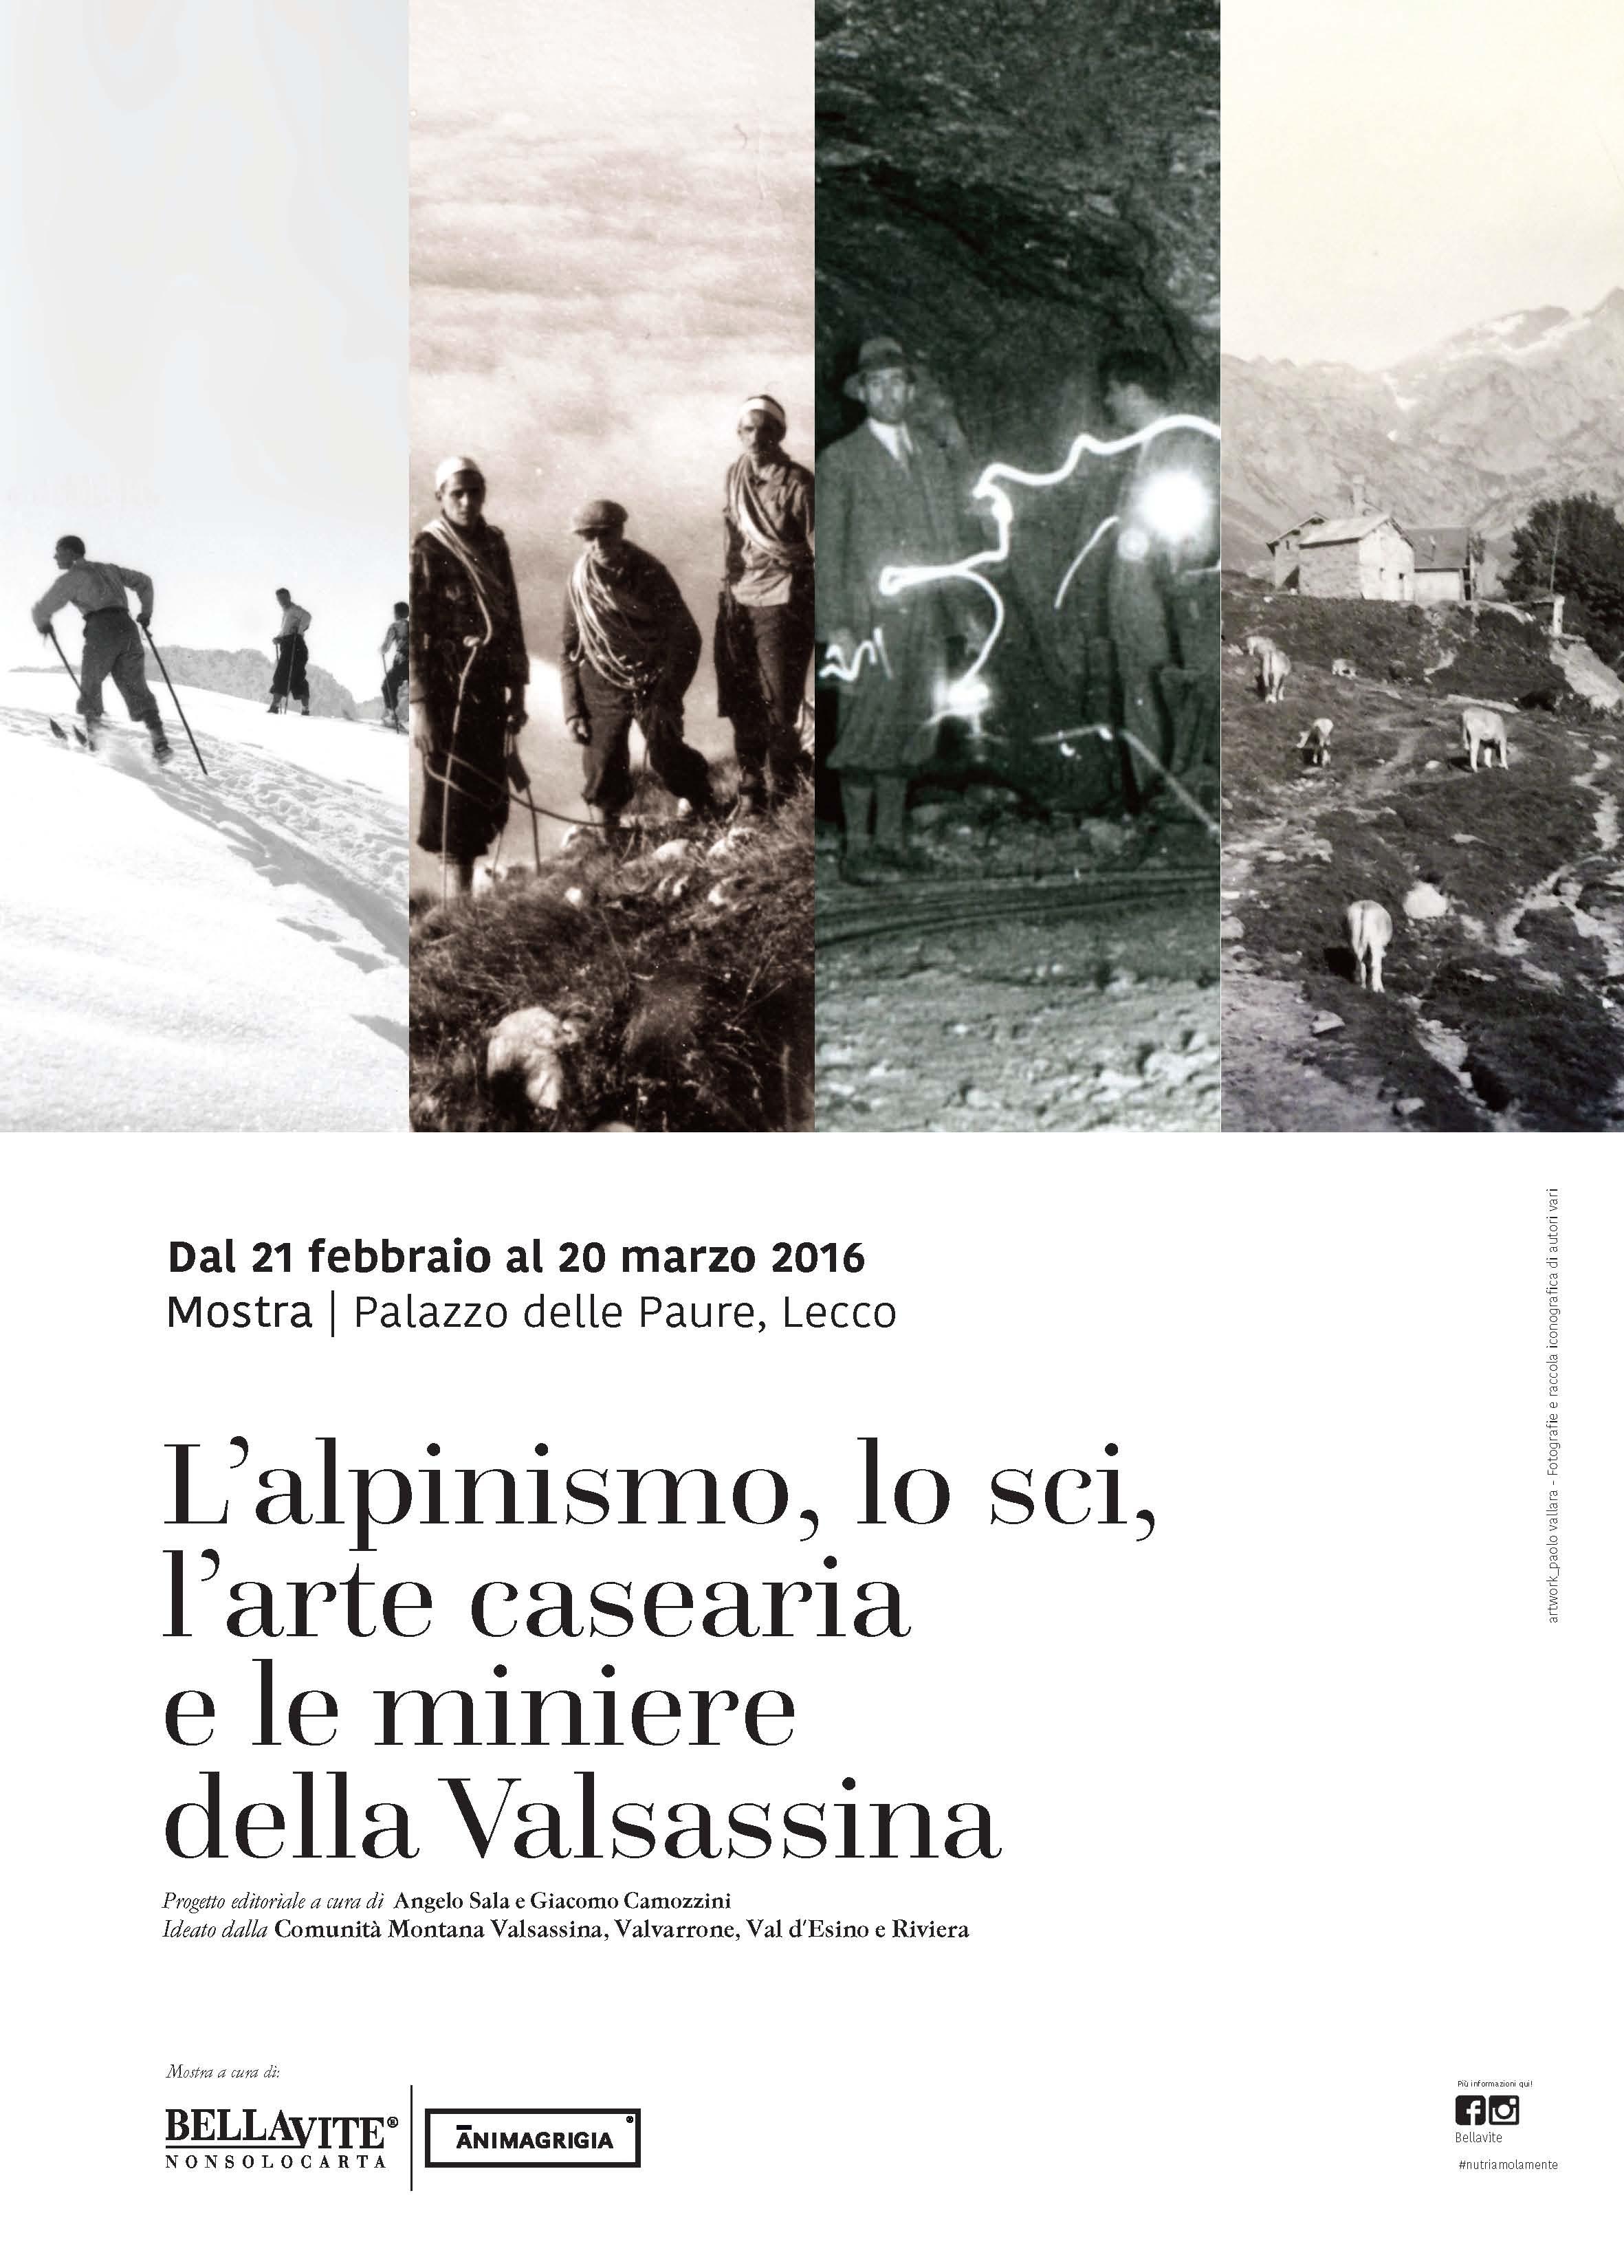 volantino mostra Valsassina Palazzo Paure_Pagina_1